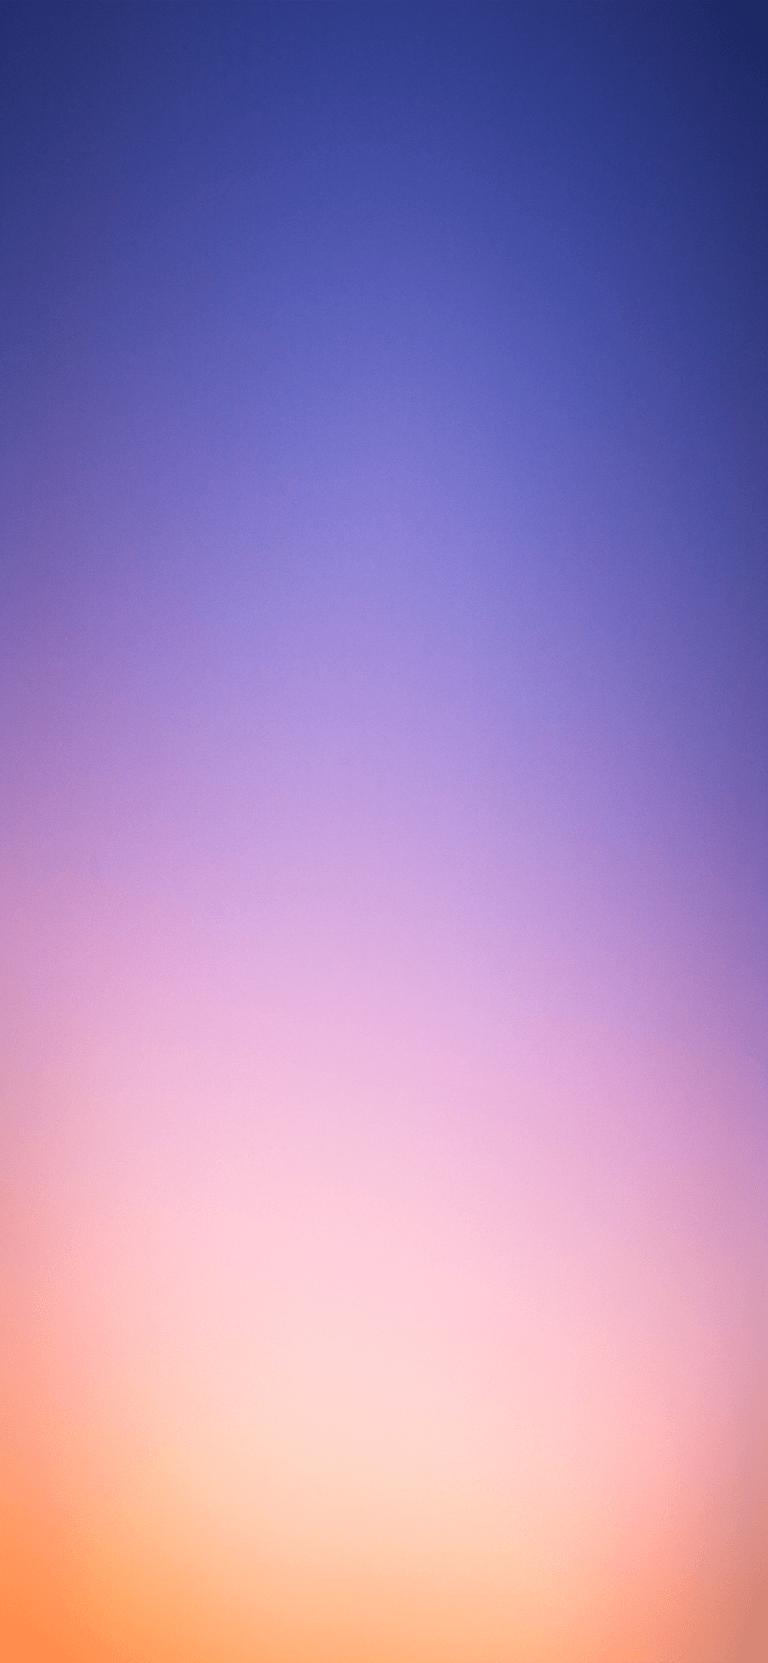 original iphone wallpapers download